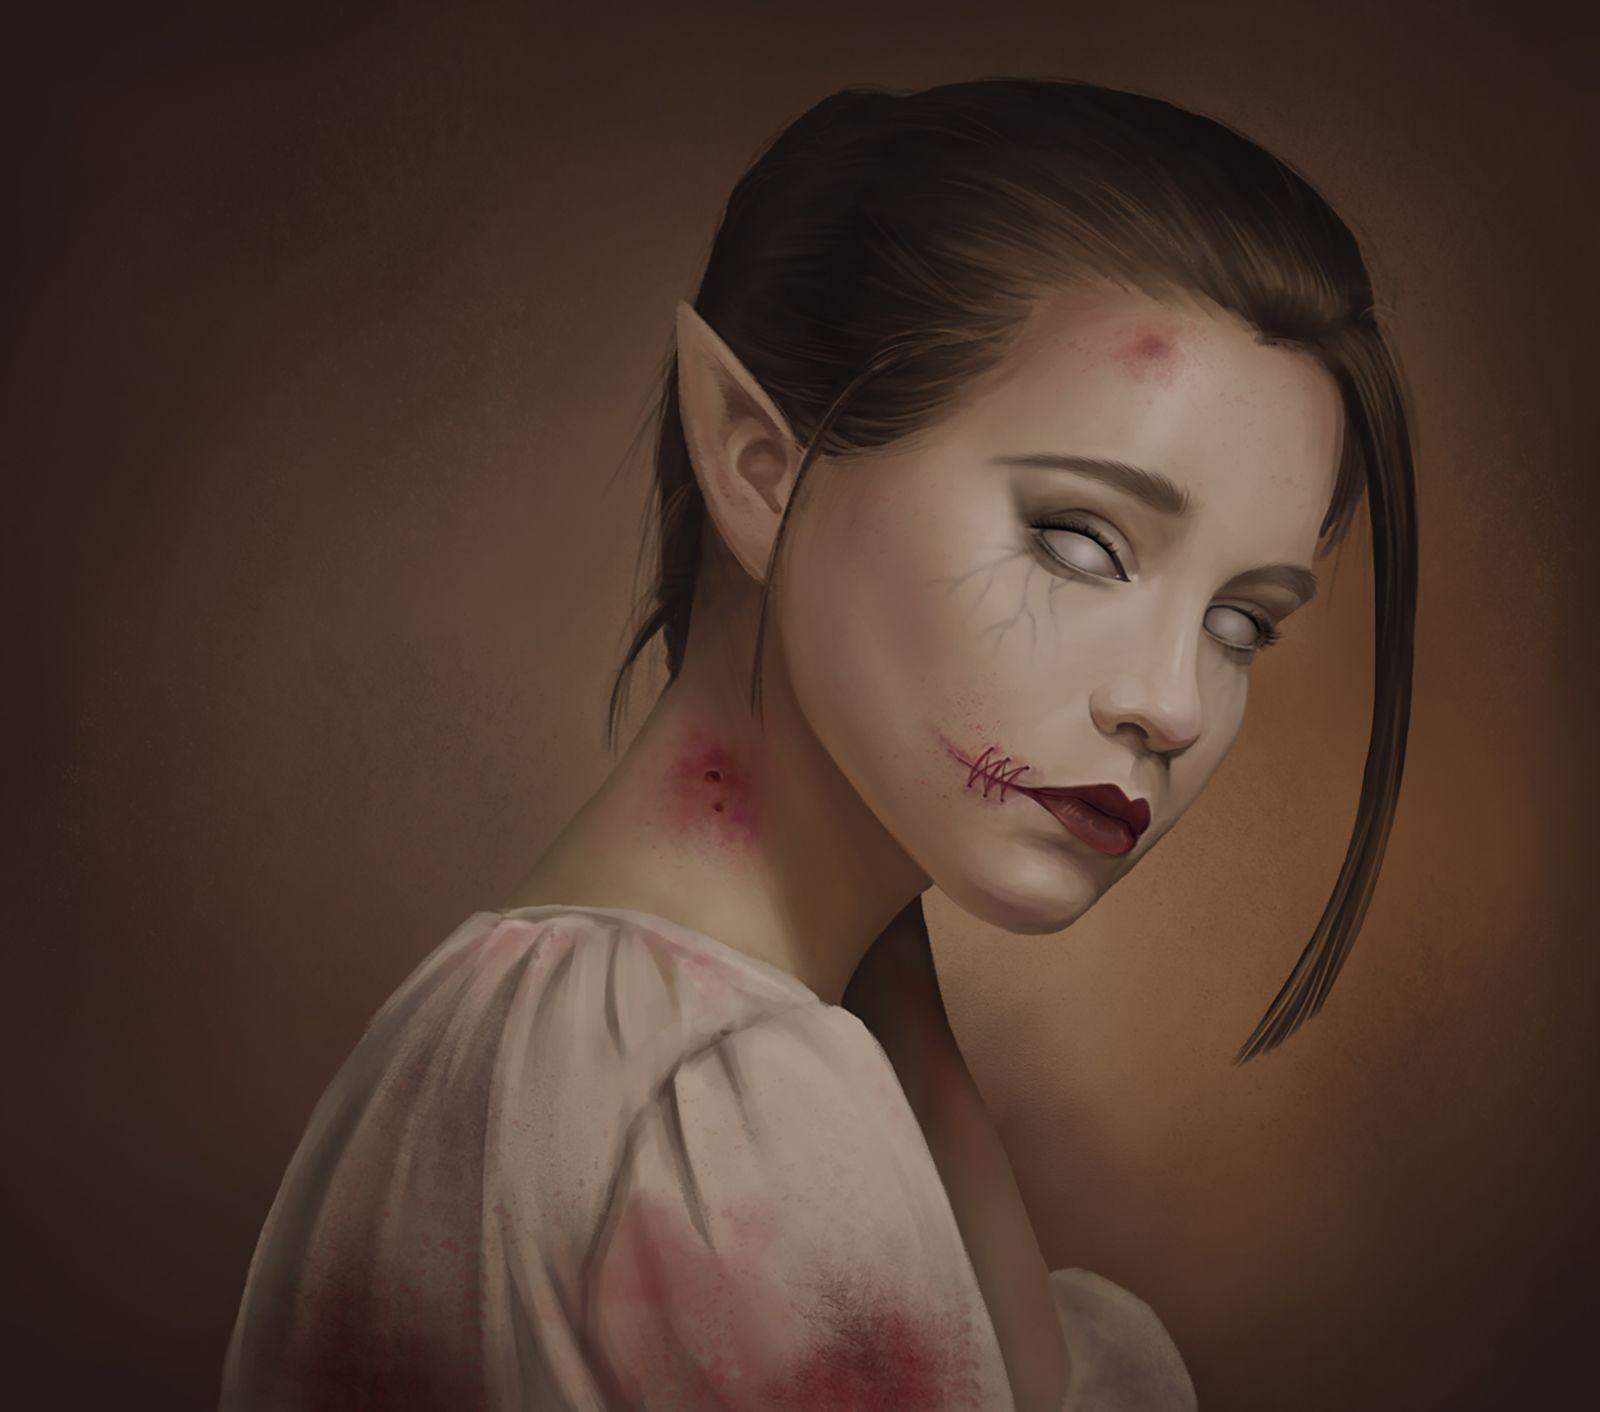 Female Portrait and Storytelling 2